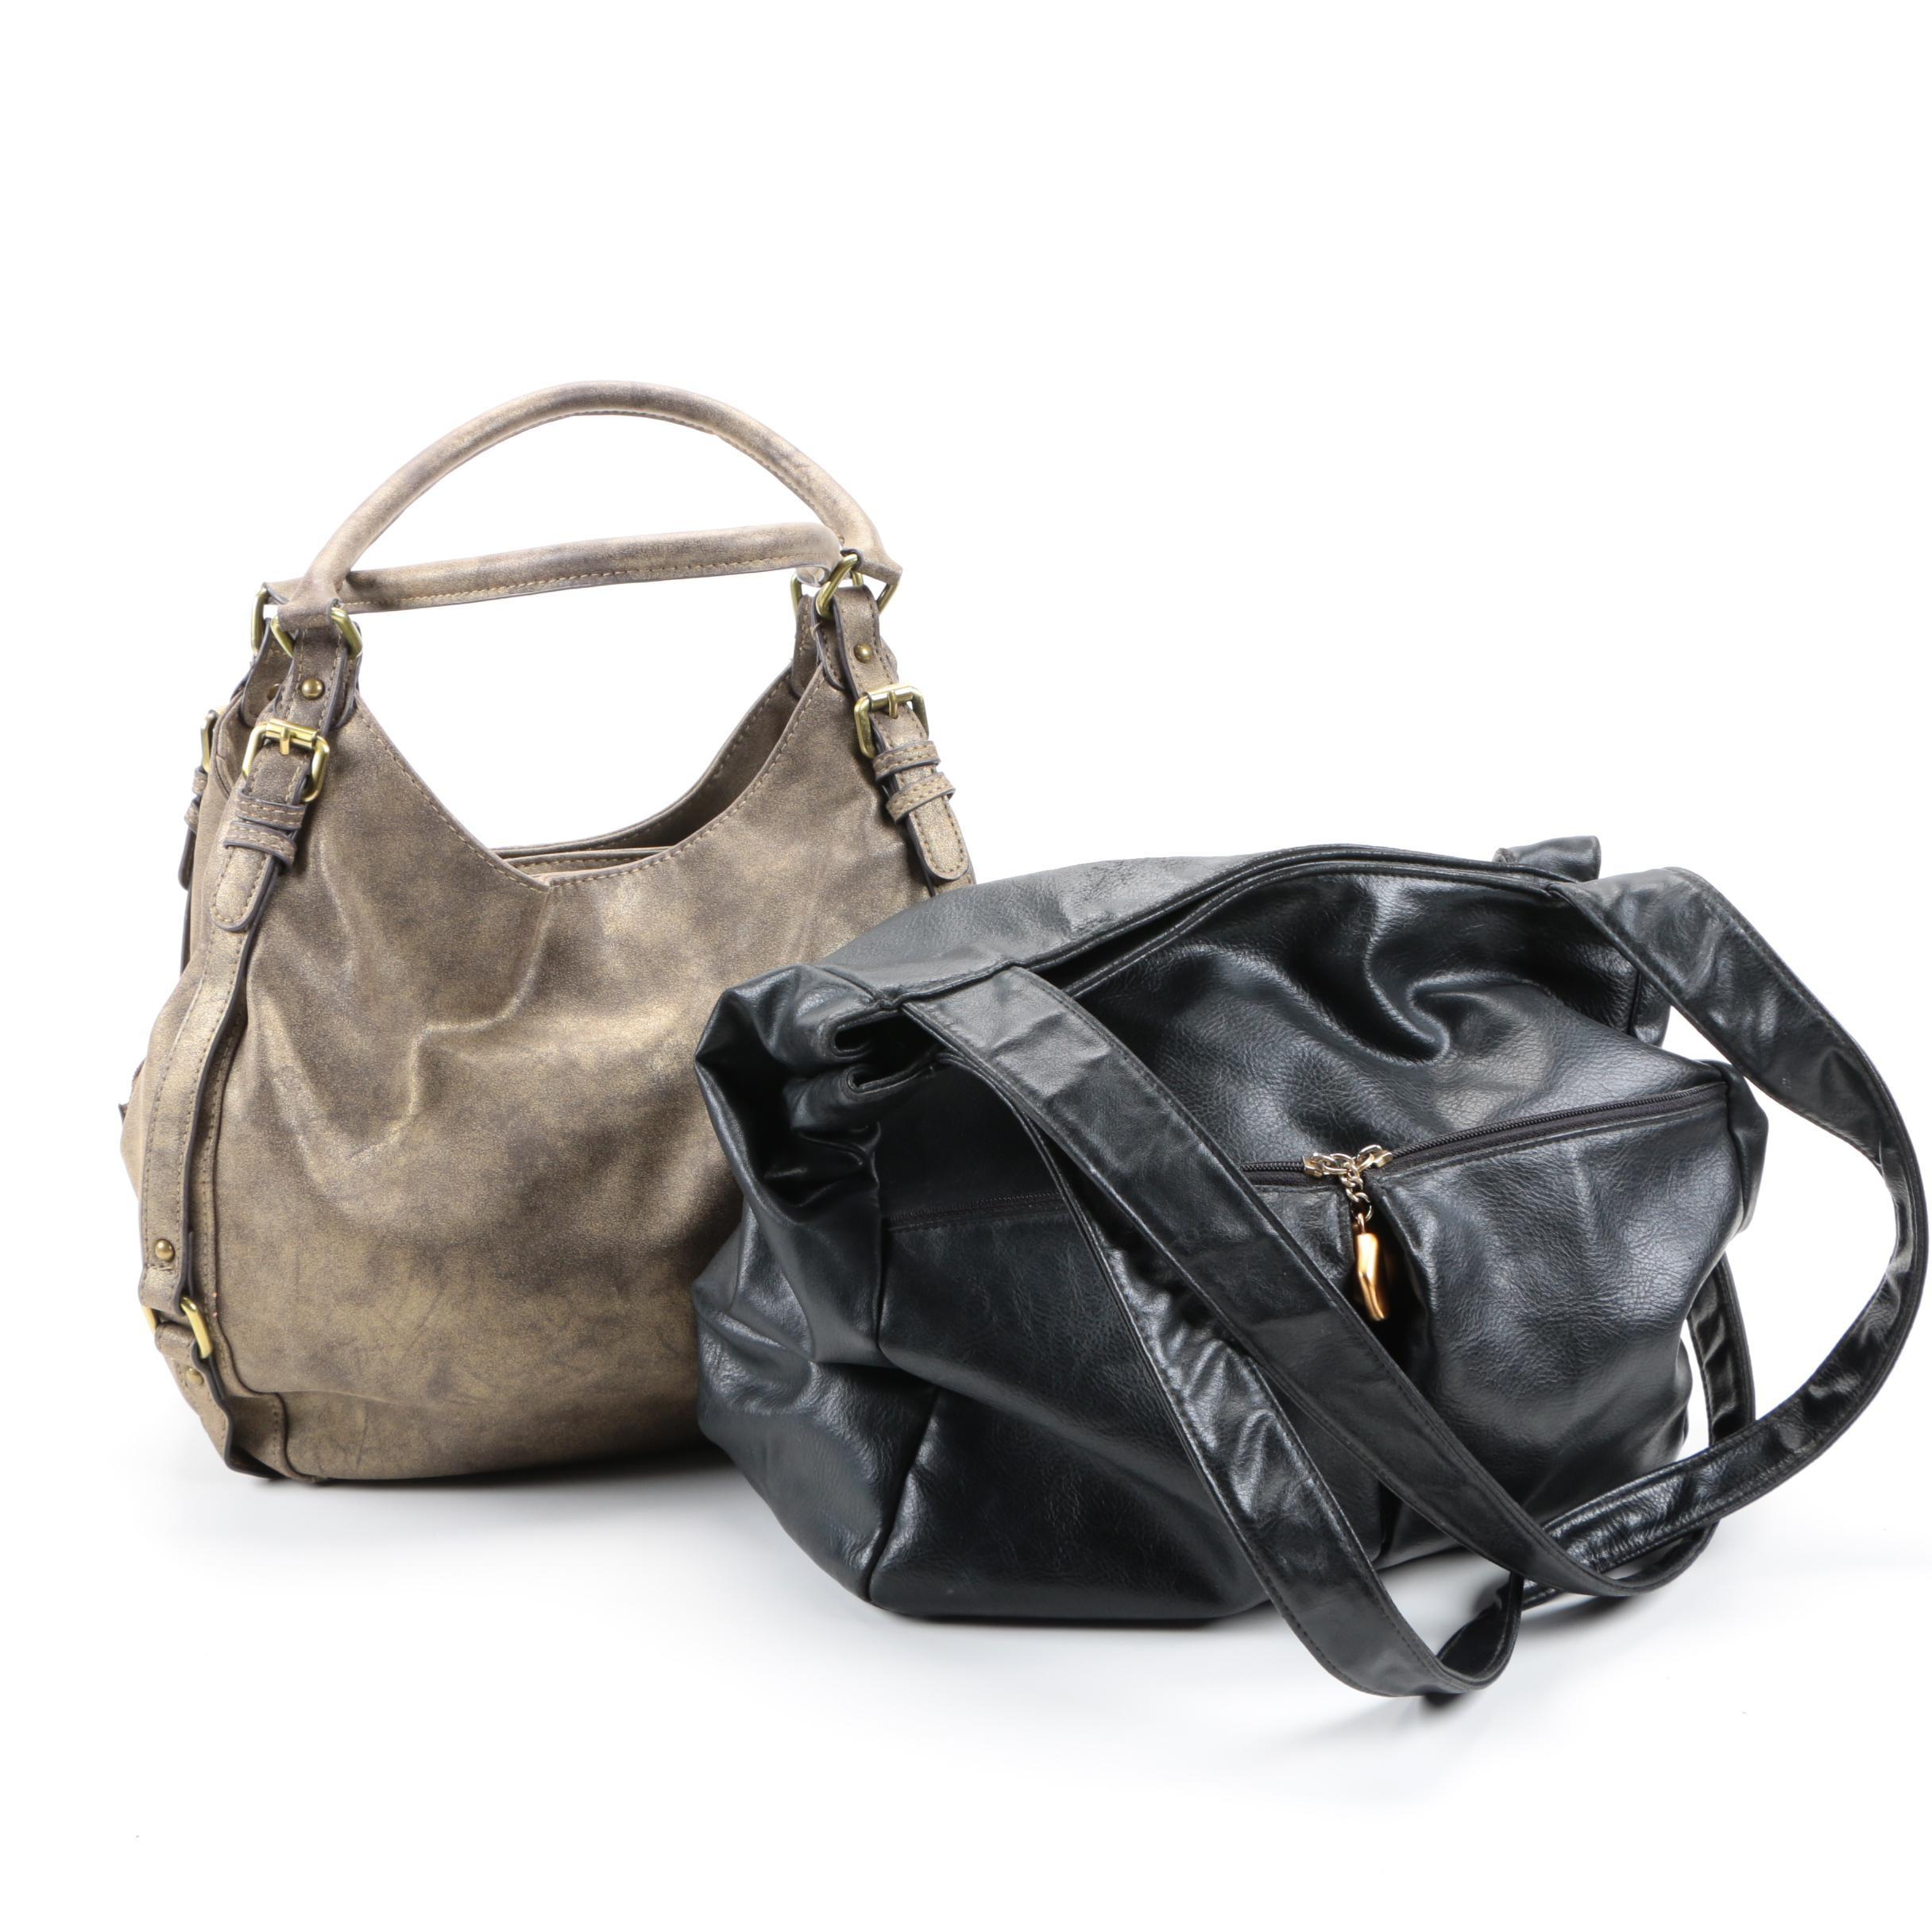 Double Strap Shoulder Bags Including Merona